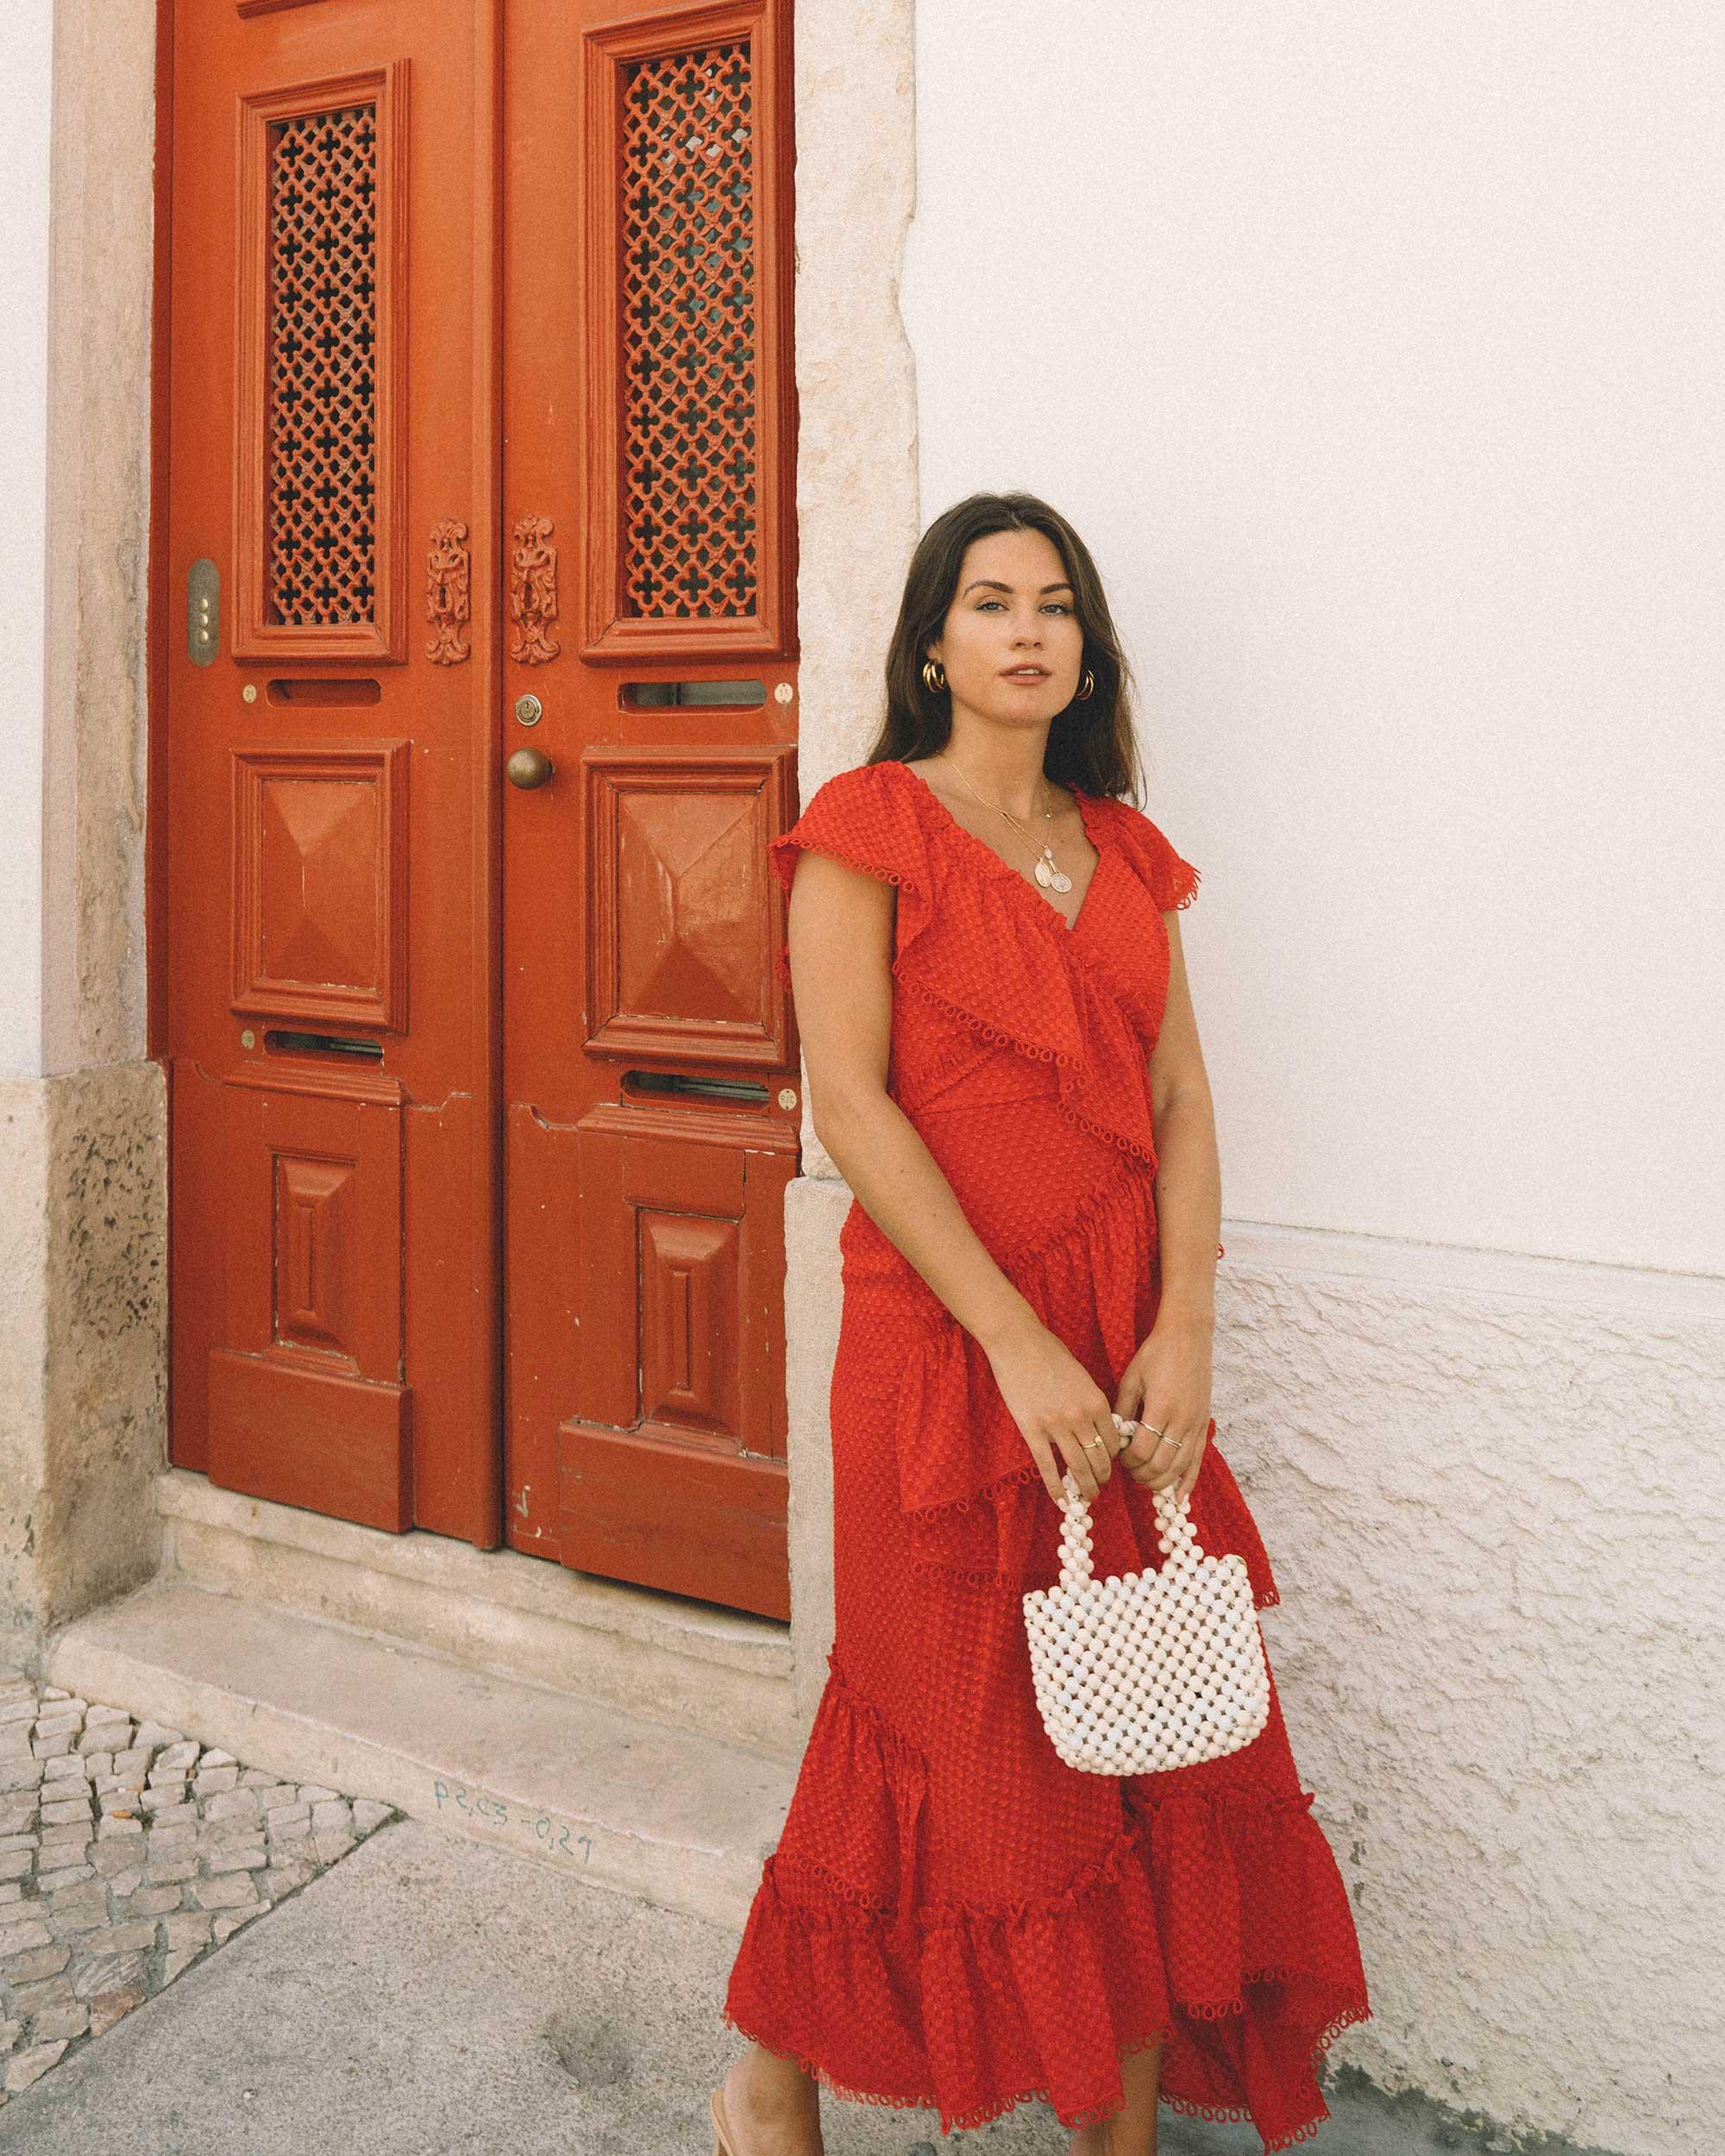 Sarah Butler of Sarah Styles Seattle wears THREE FLOOR Rouge tiered midi dress in Lisbon, Portugal | @sarahchristine 7.jpg